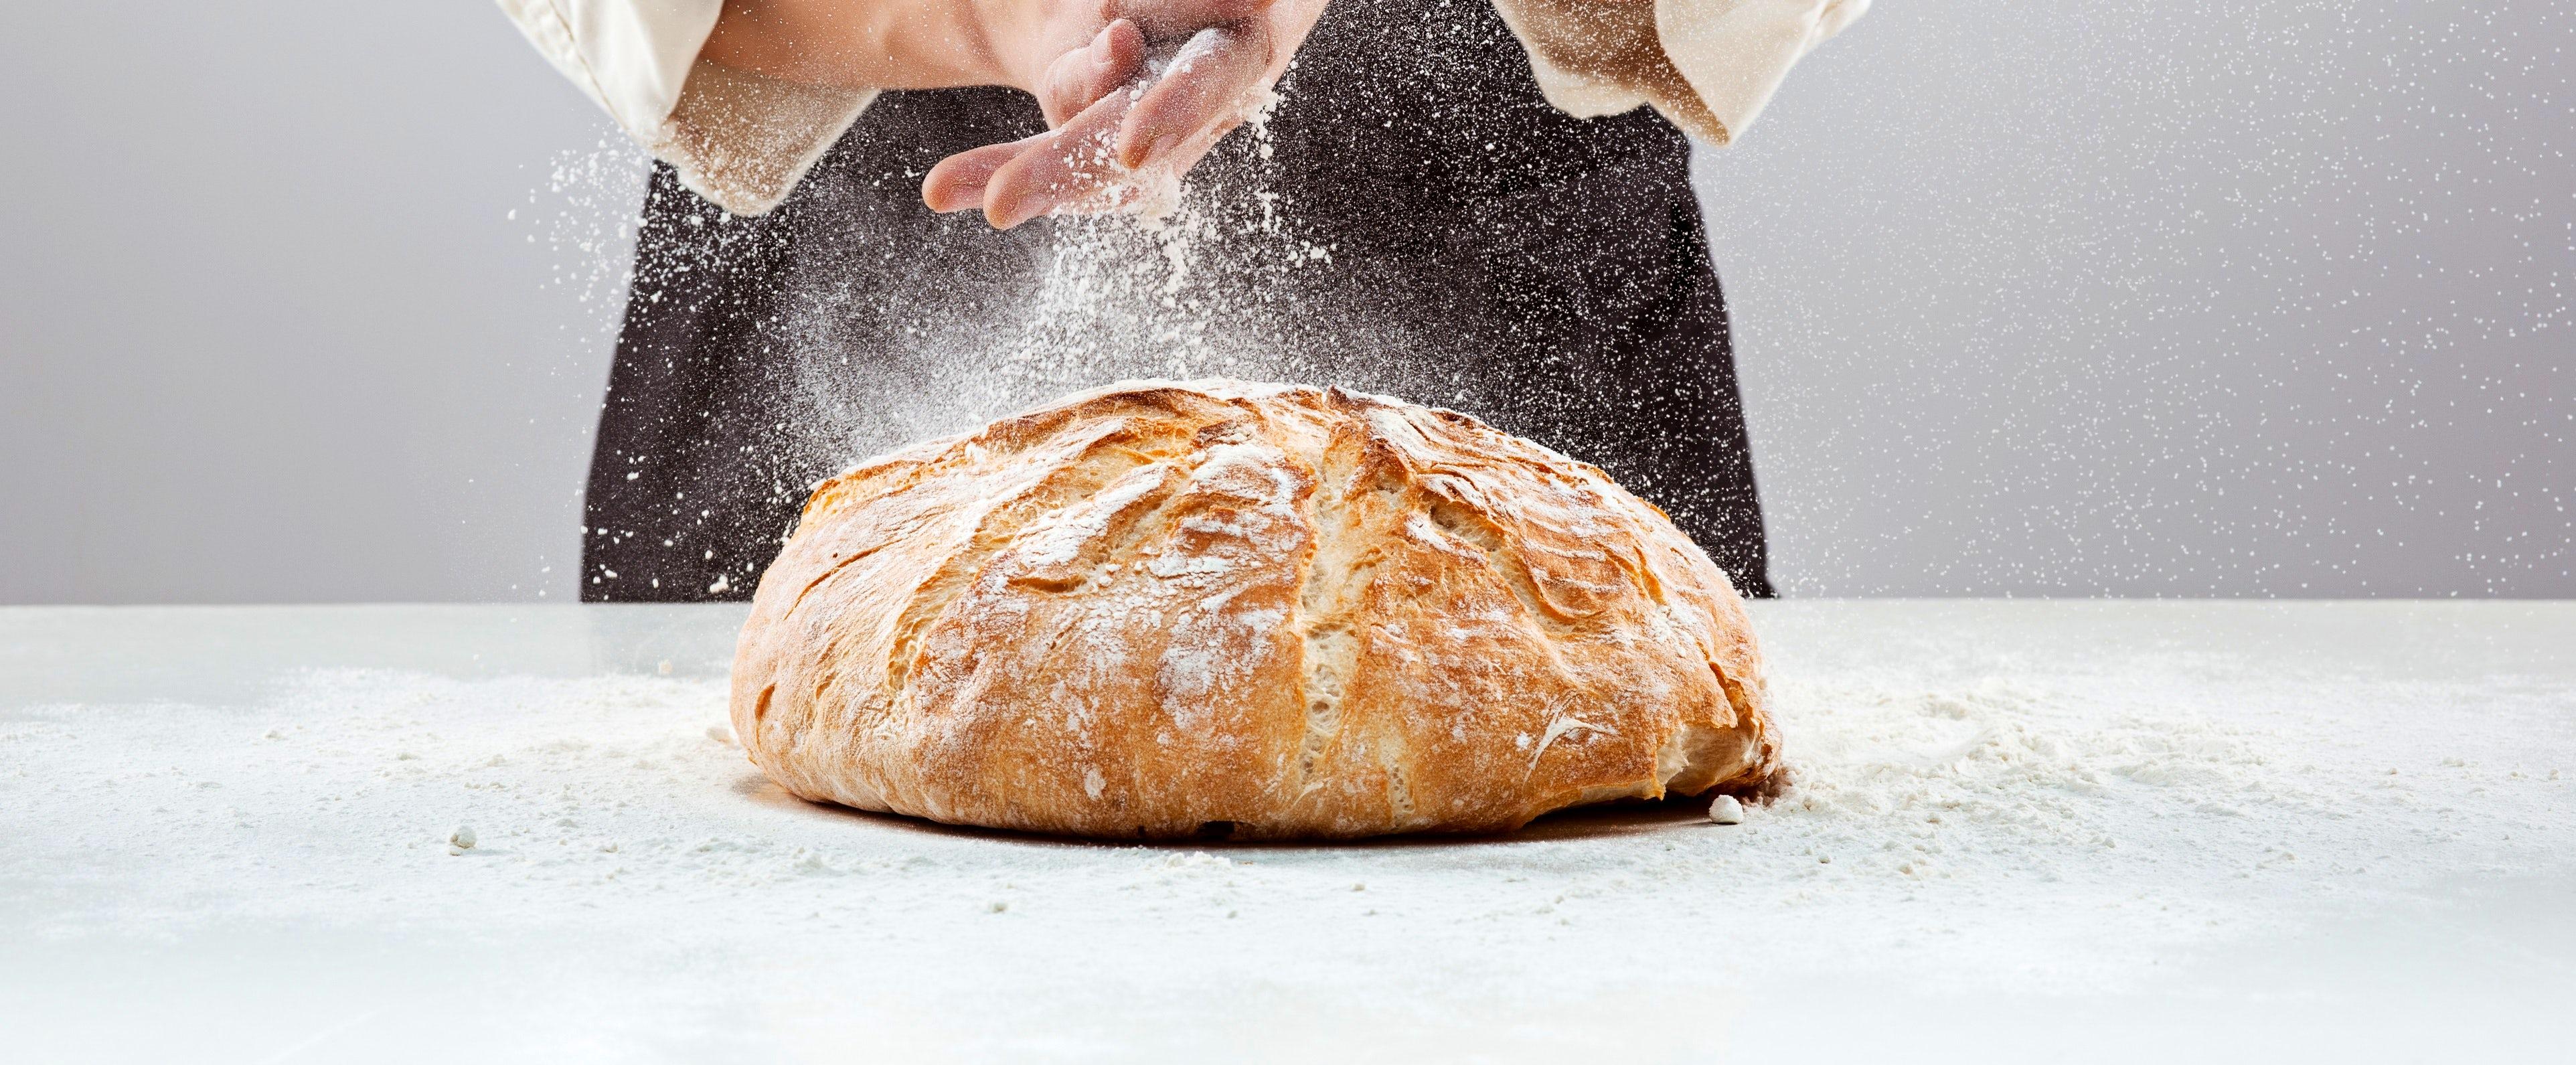 Traditional Serbian bread pogaca